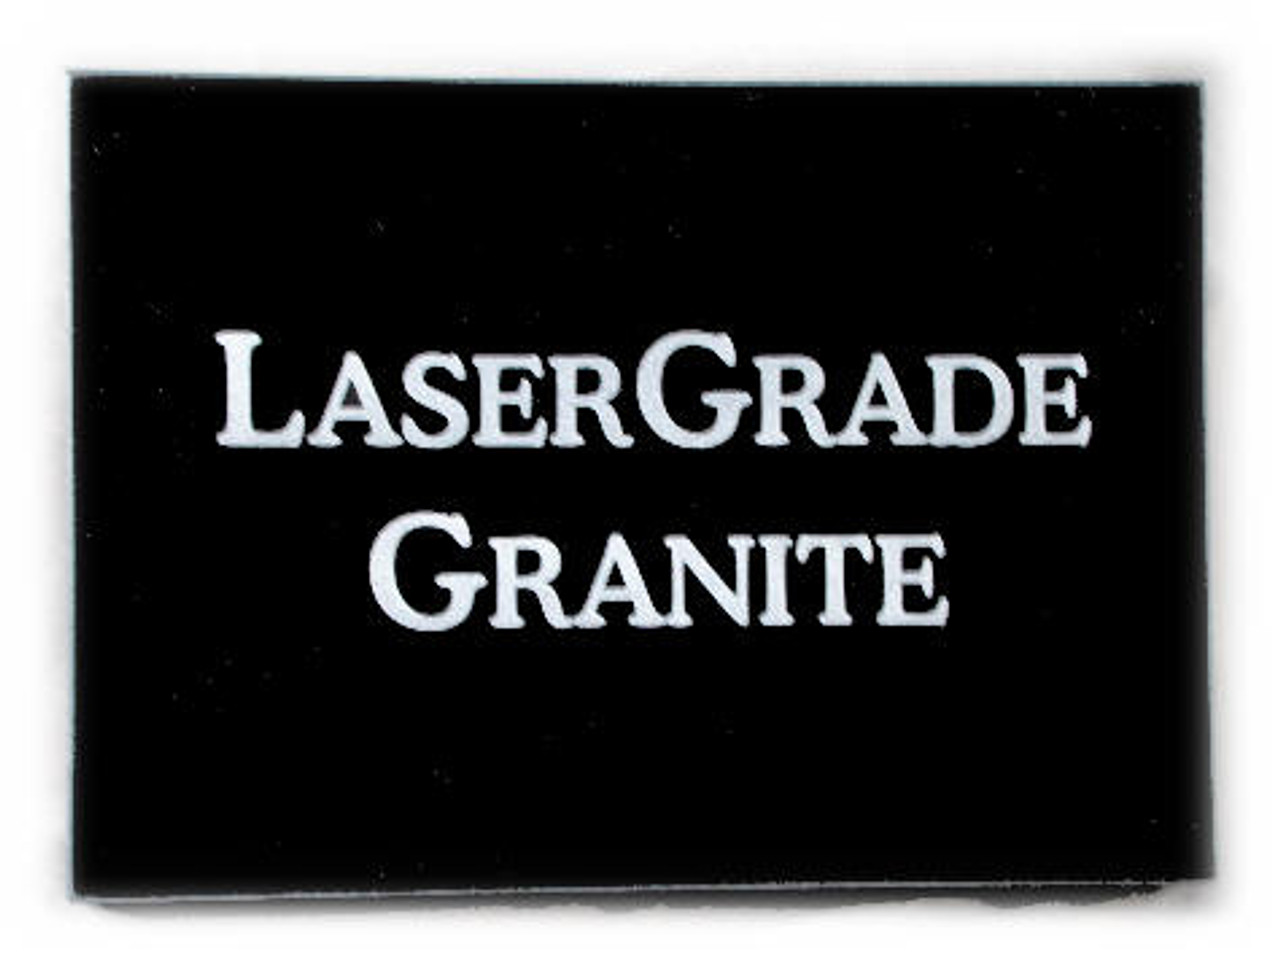 "G-MB-18 x 18 x 3/8EP, LaserGrade, MB Black Granite, 18"" x 18"" x 3/8"" , Edges Polished, (5 face polished)"